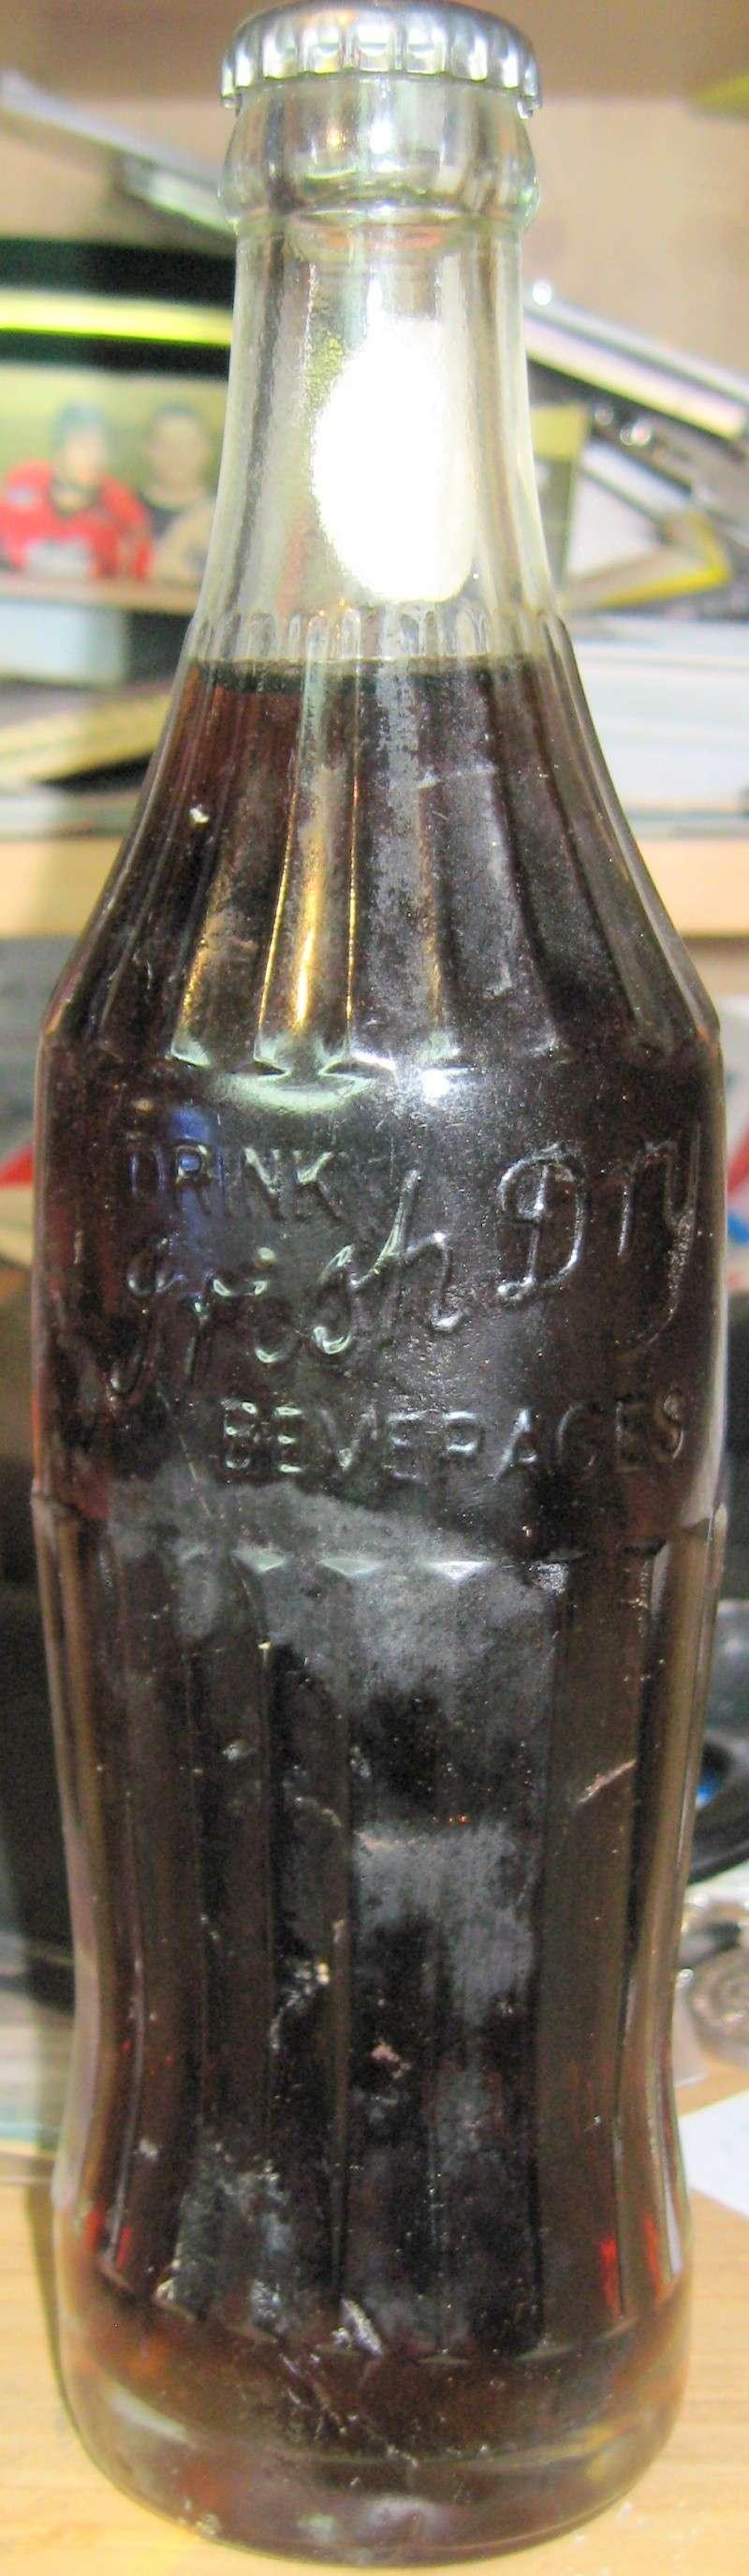 drink irish dry beverages  Dr_sun16